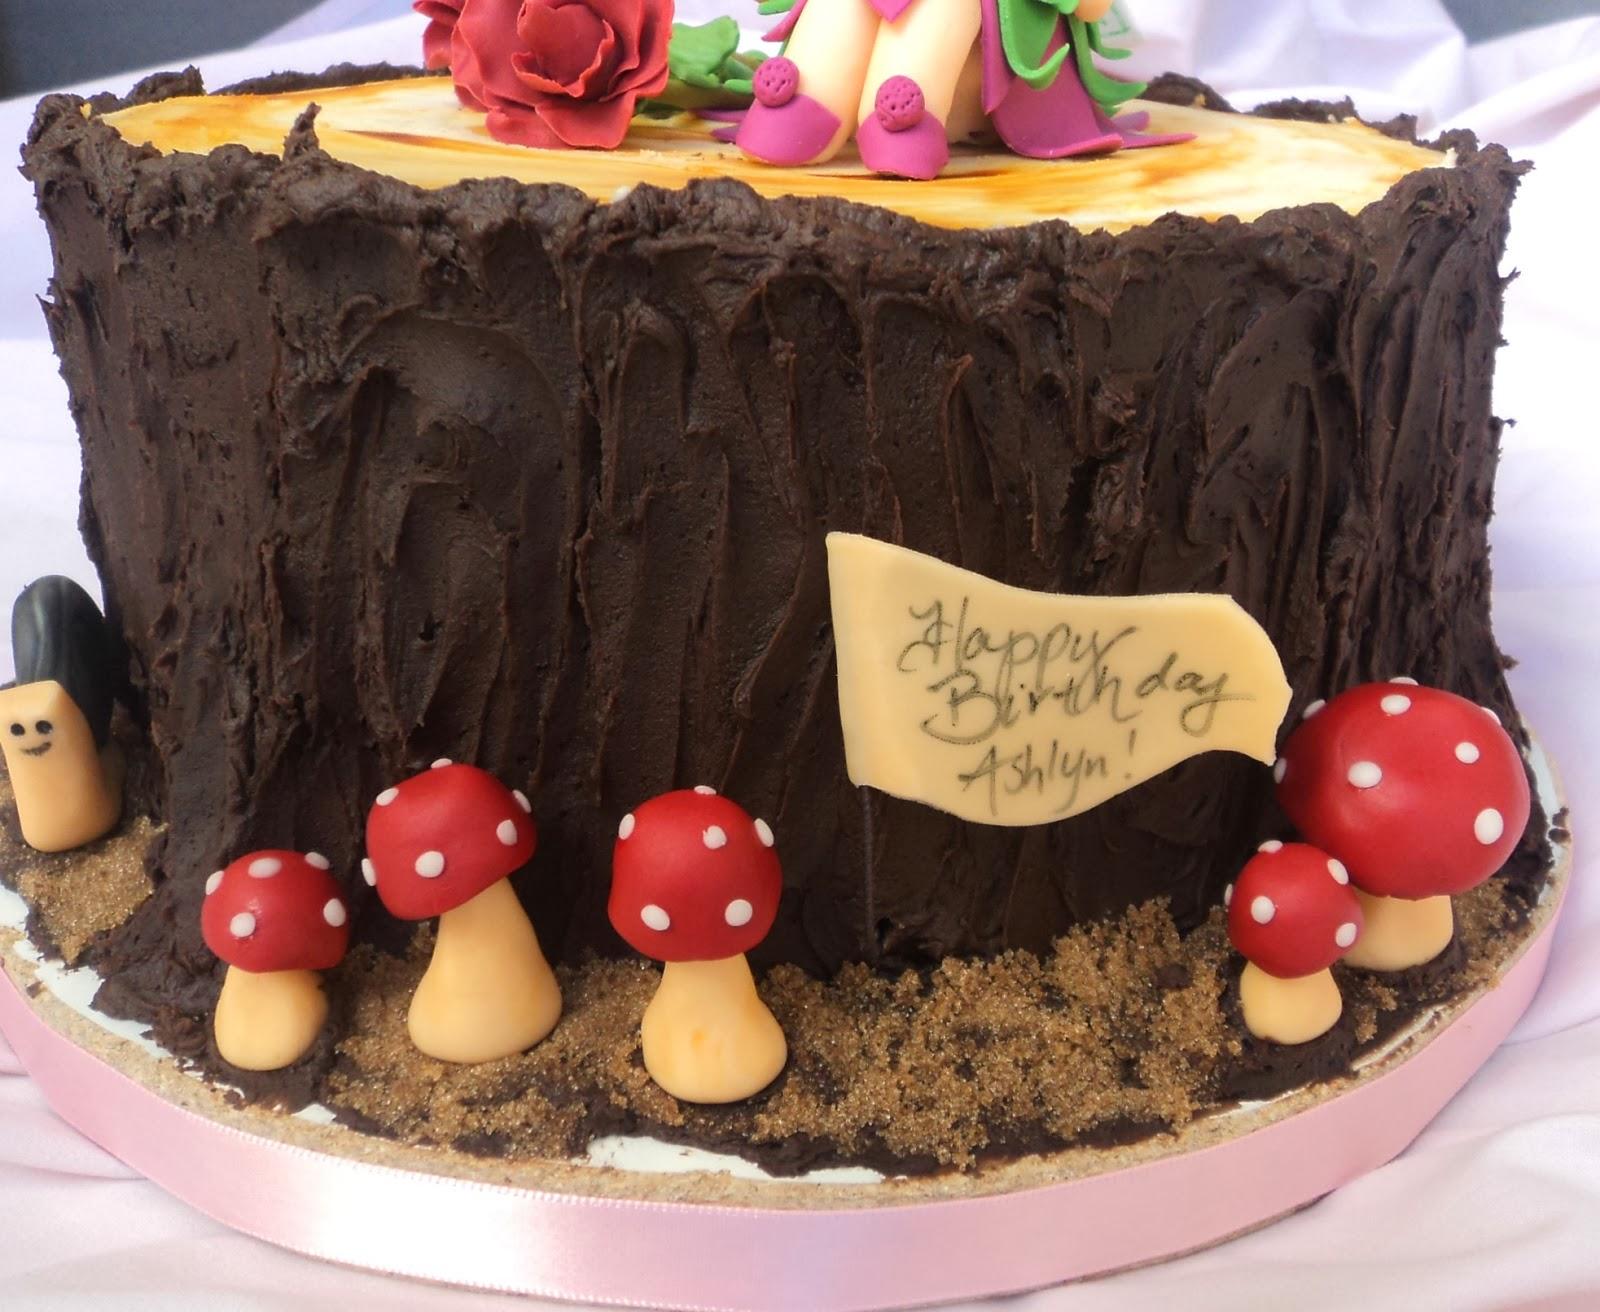 Birthday Chocolate Cake Hd Images Happy Birthday Chocolate Cake Hd